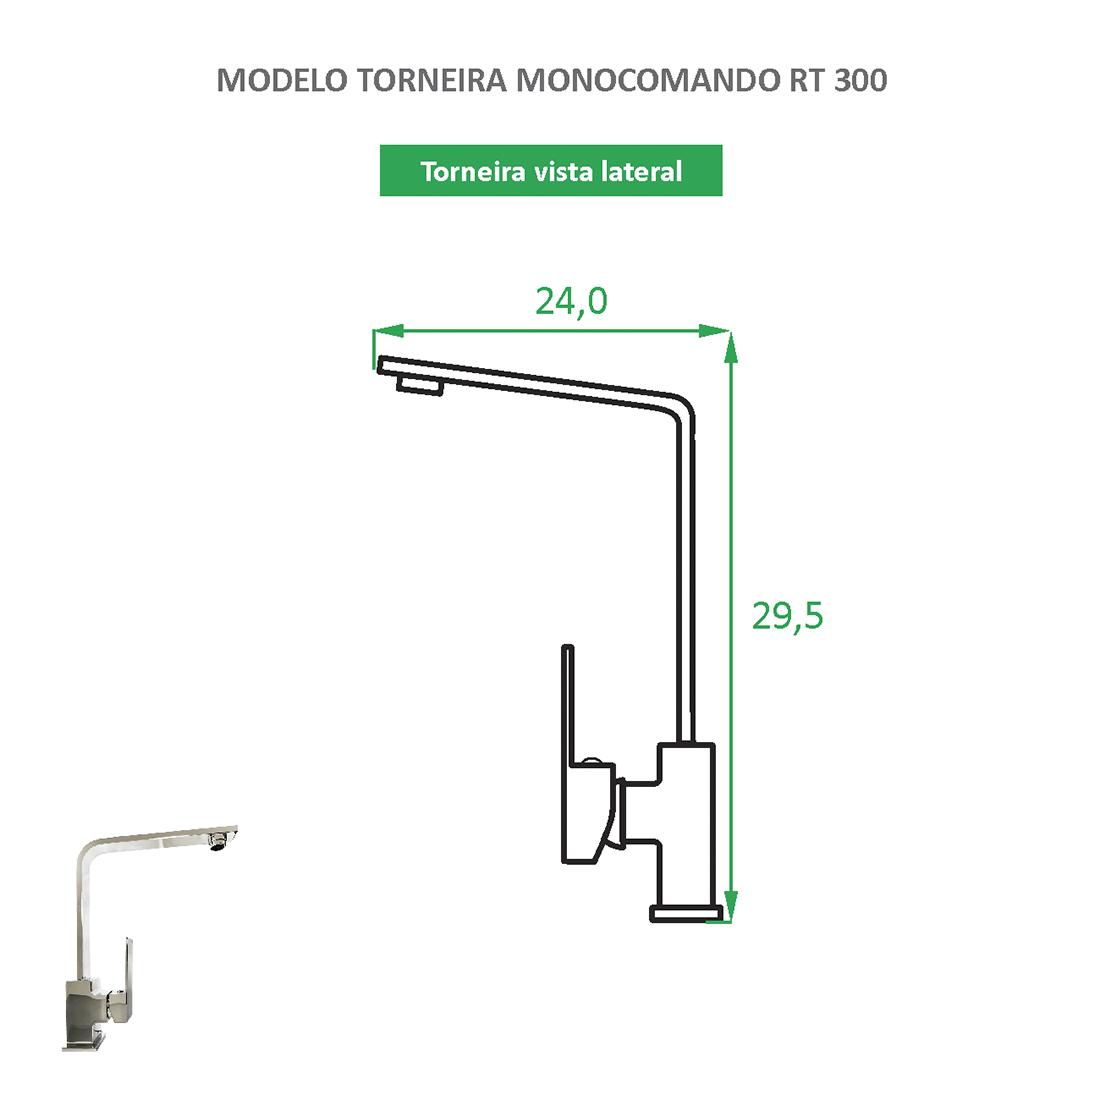 Torneira Monocomando bica alta RT 300